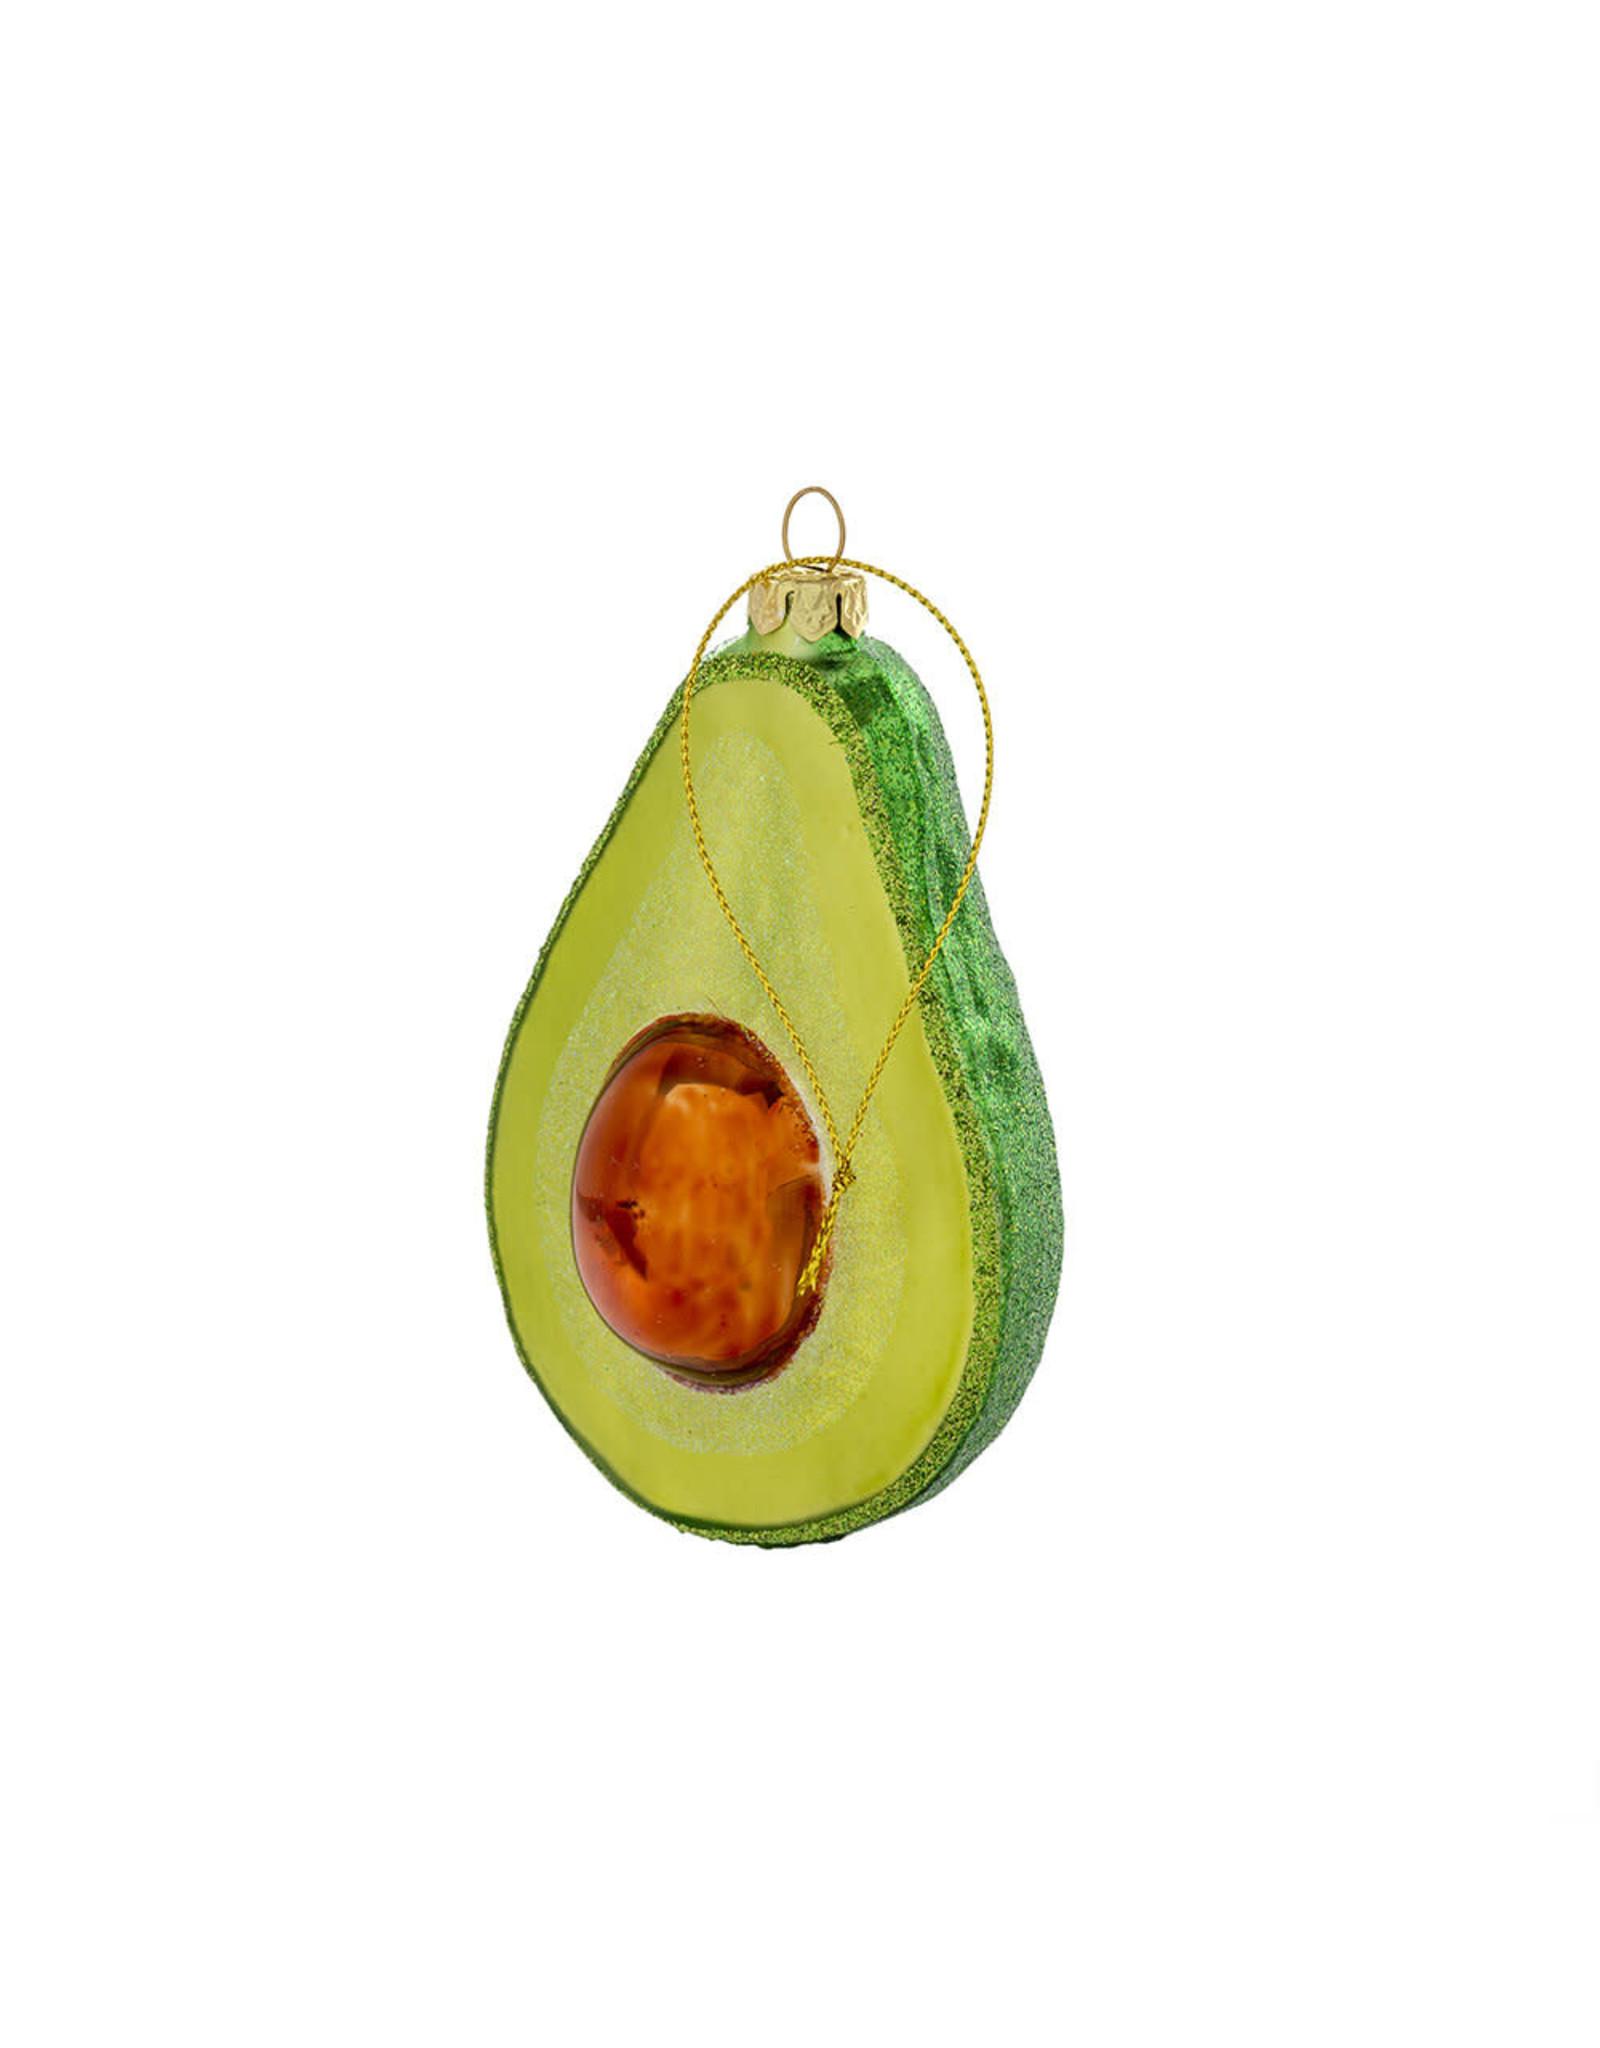 Indaba indaba - Festive Avocado ornament